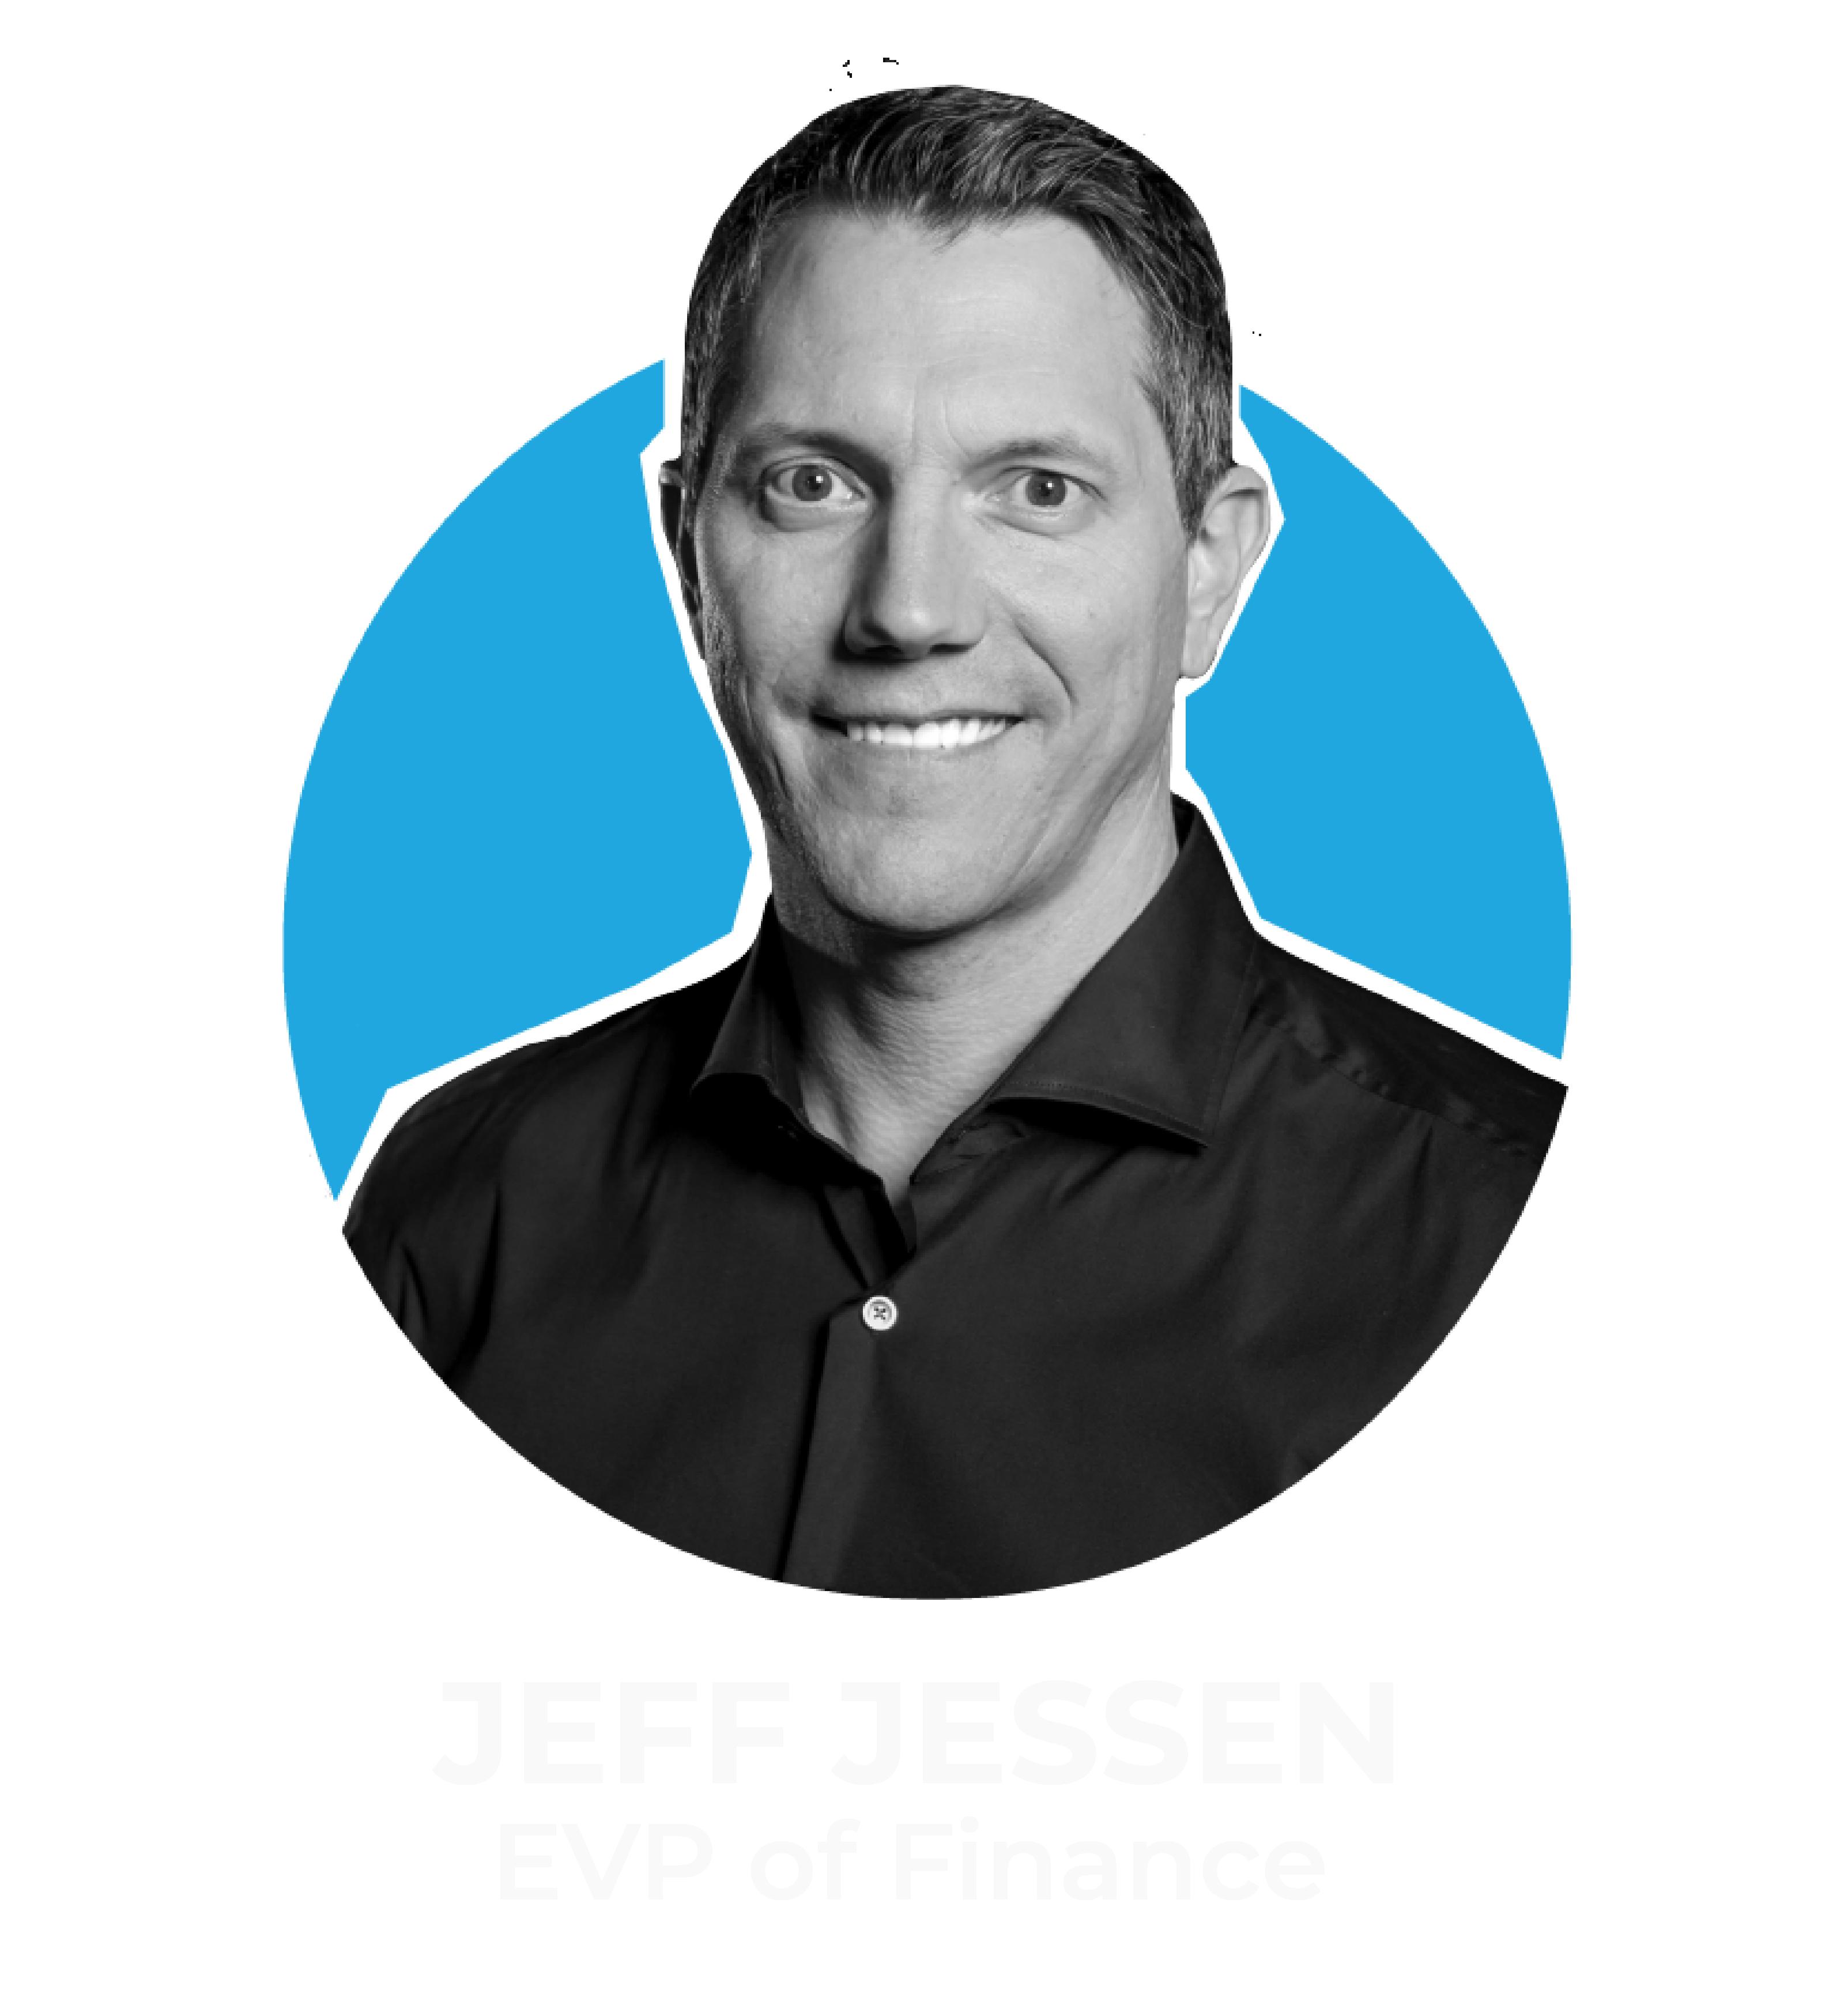 Jeff Jessen